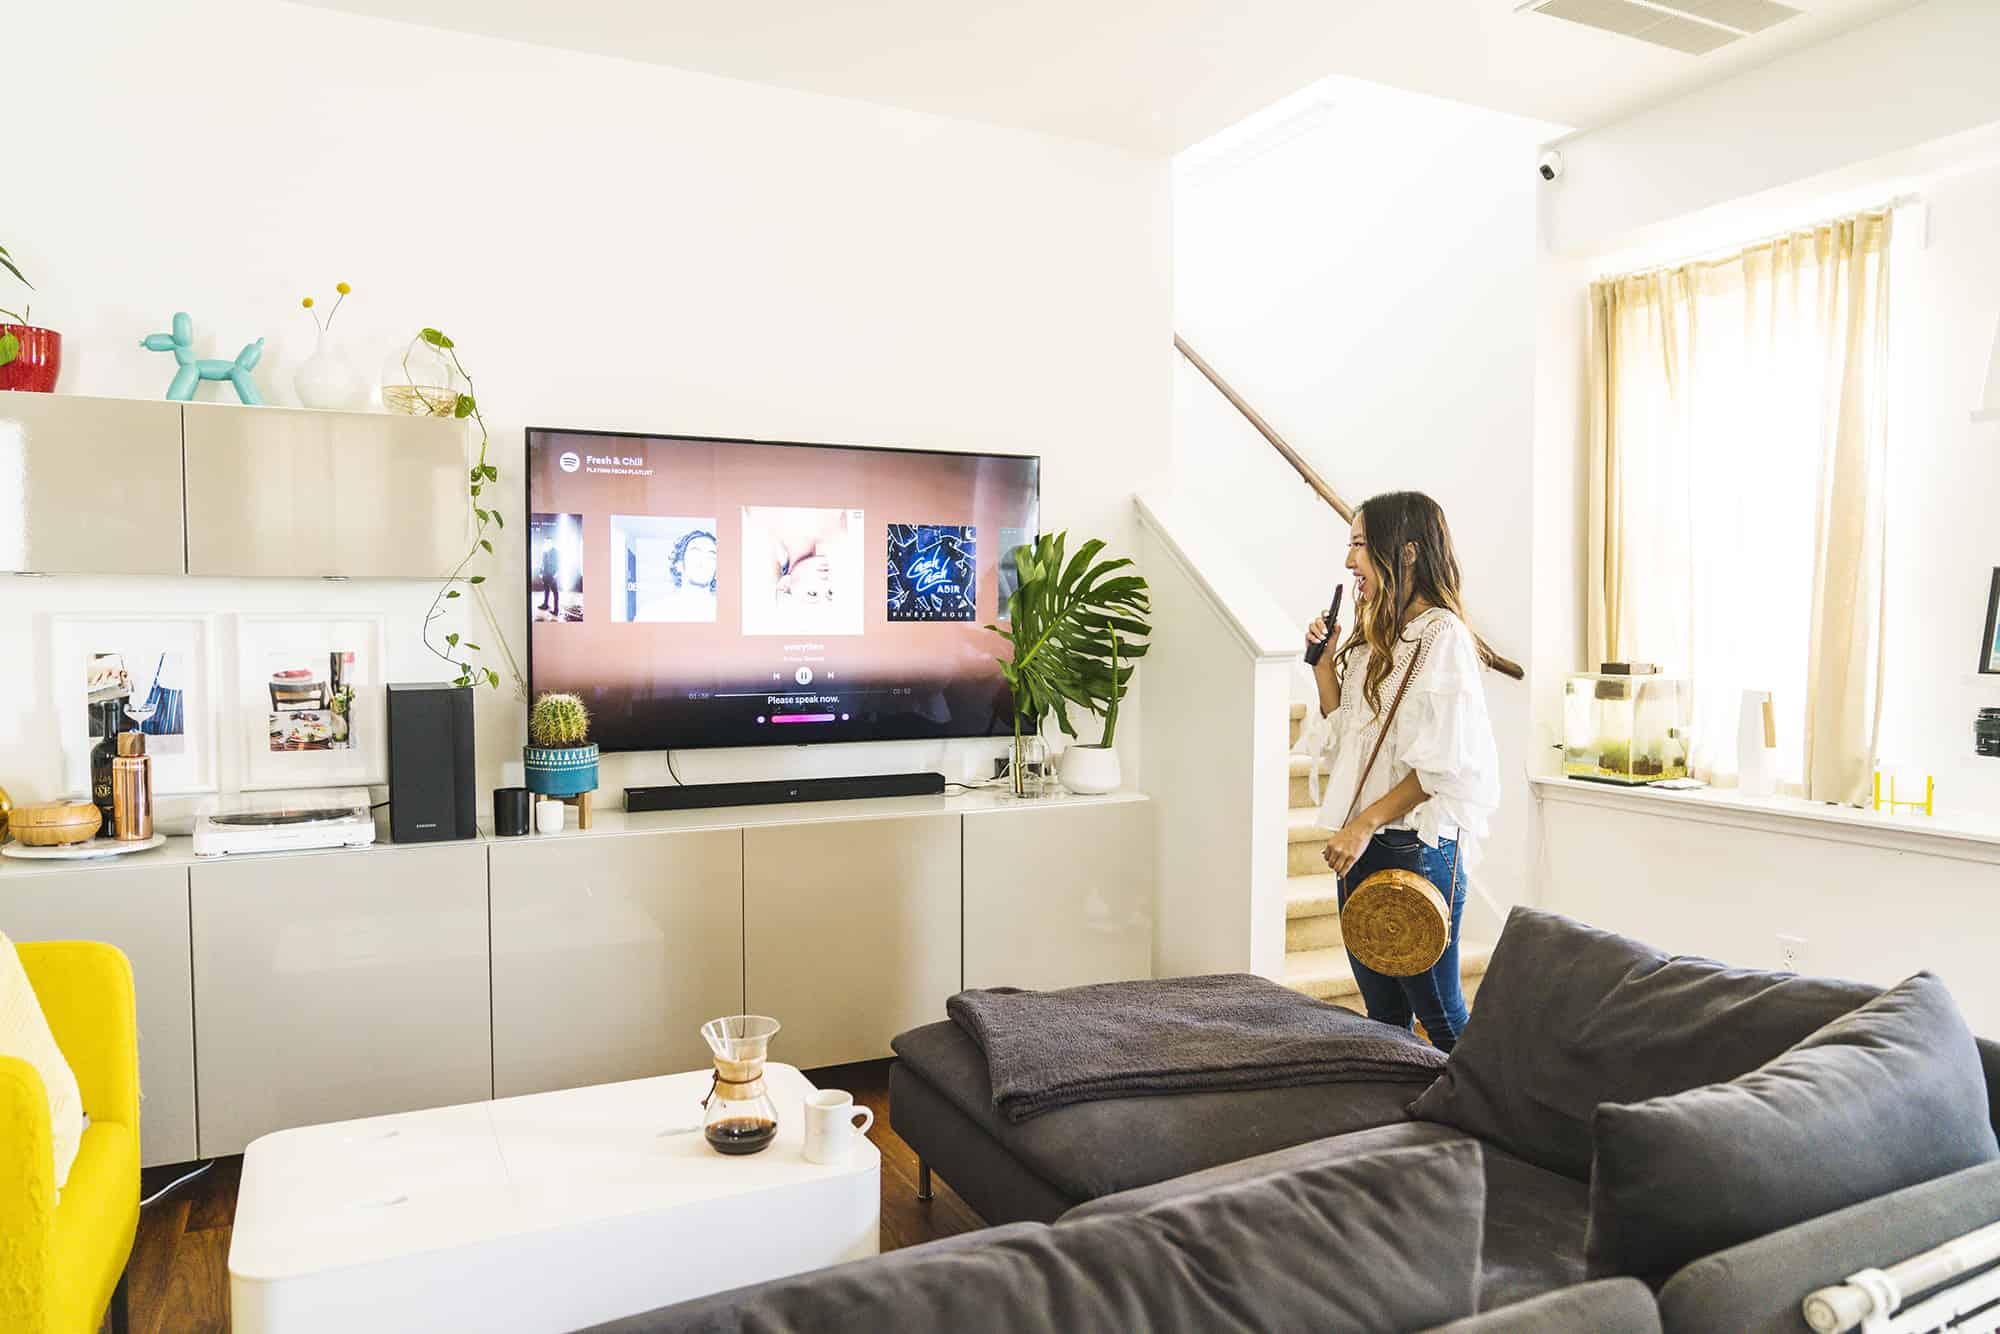 LG SK9000 LG AI TV